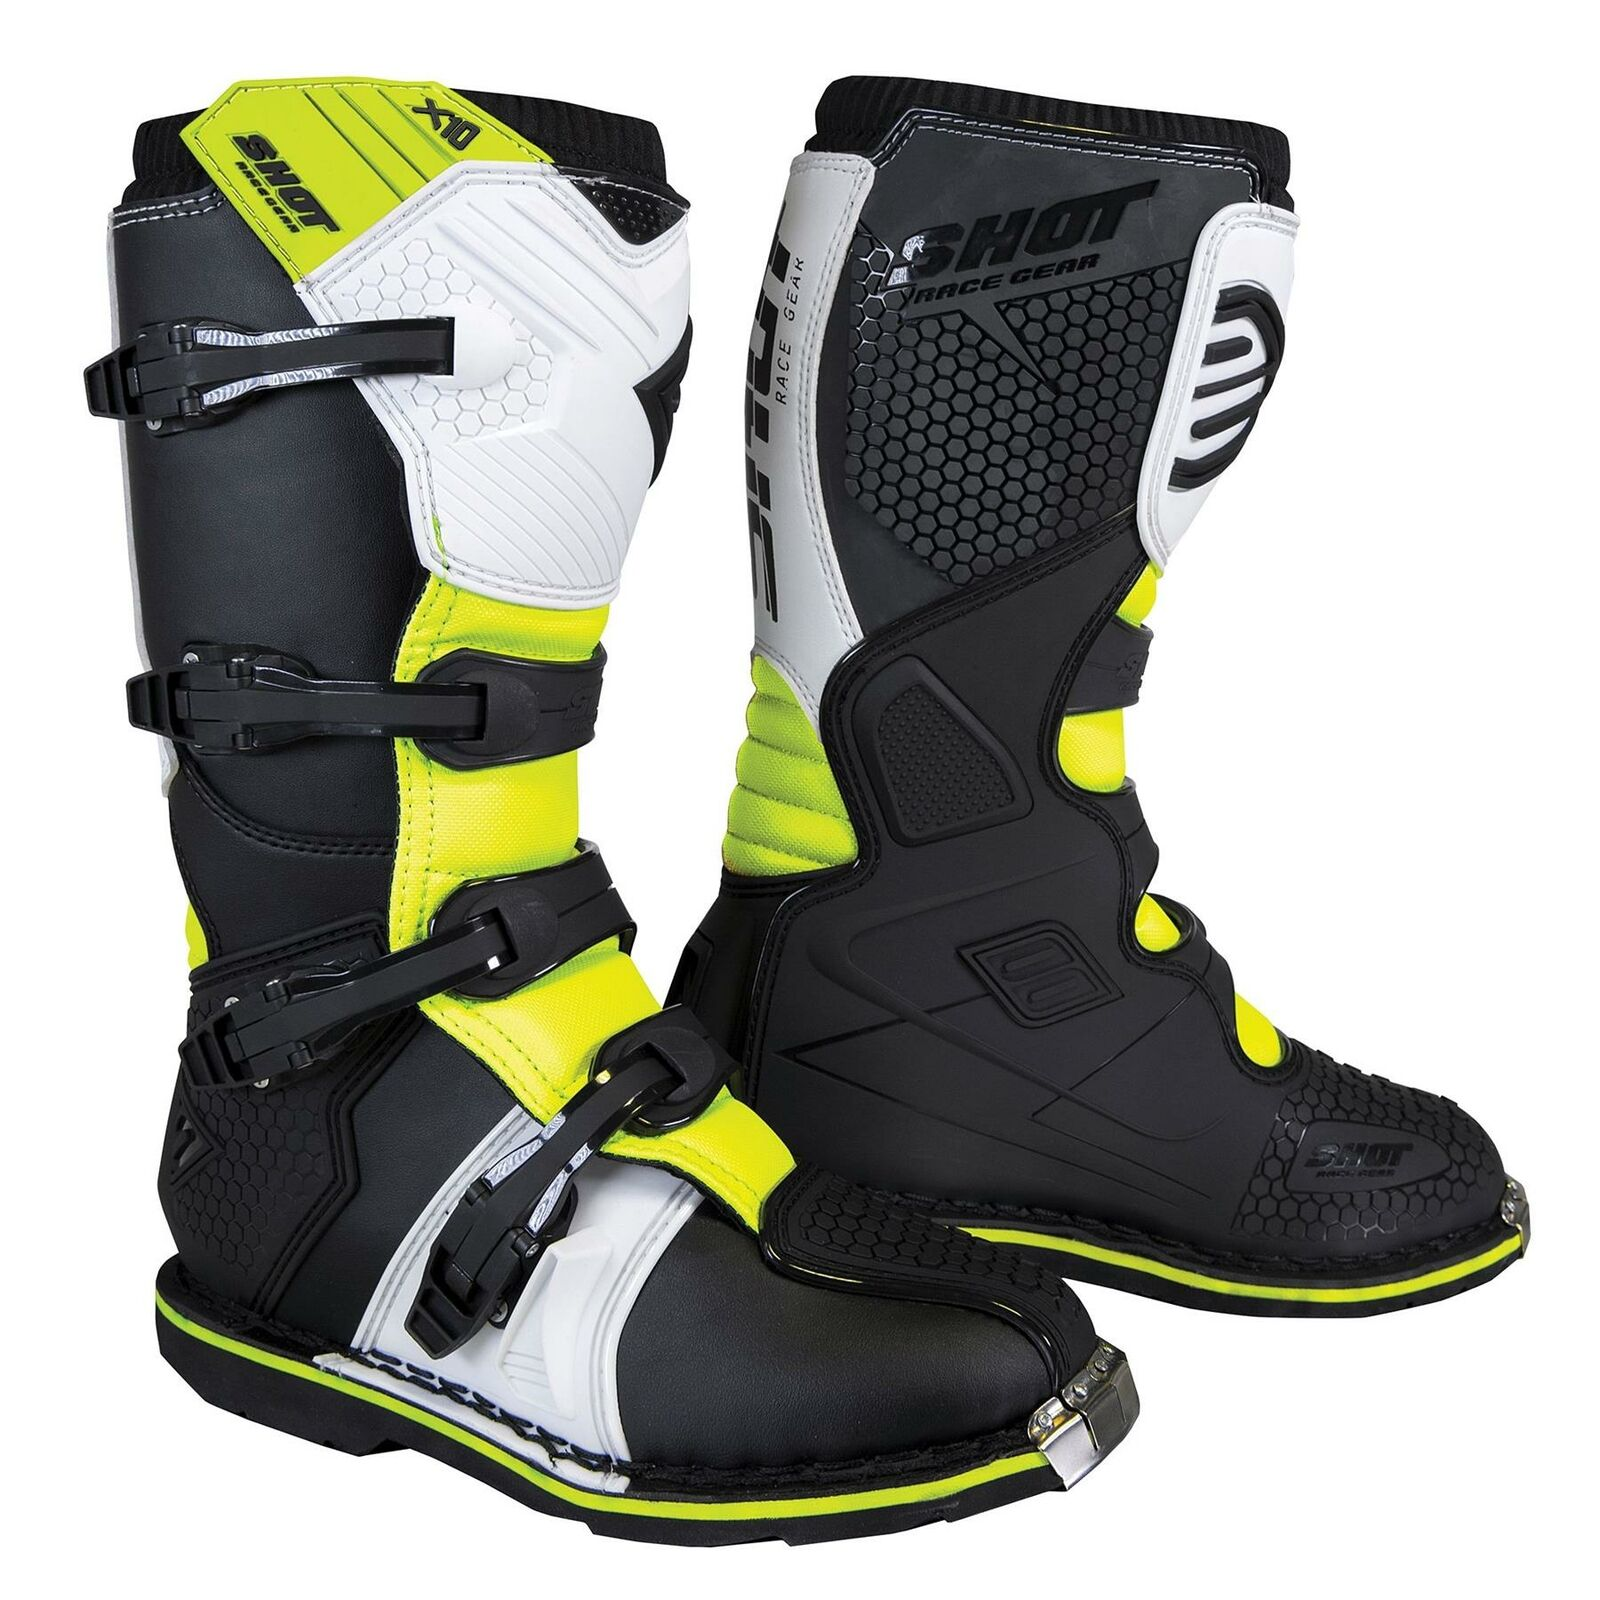 Acerbis 0021596.315 Stivali Motocross Uomo X pro V. IT 45